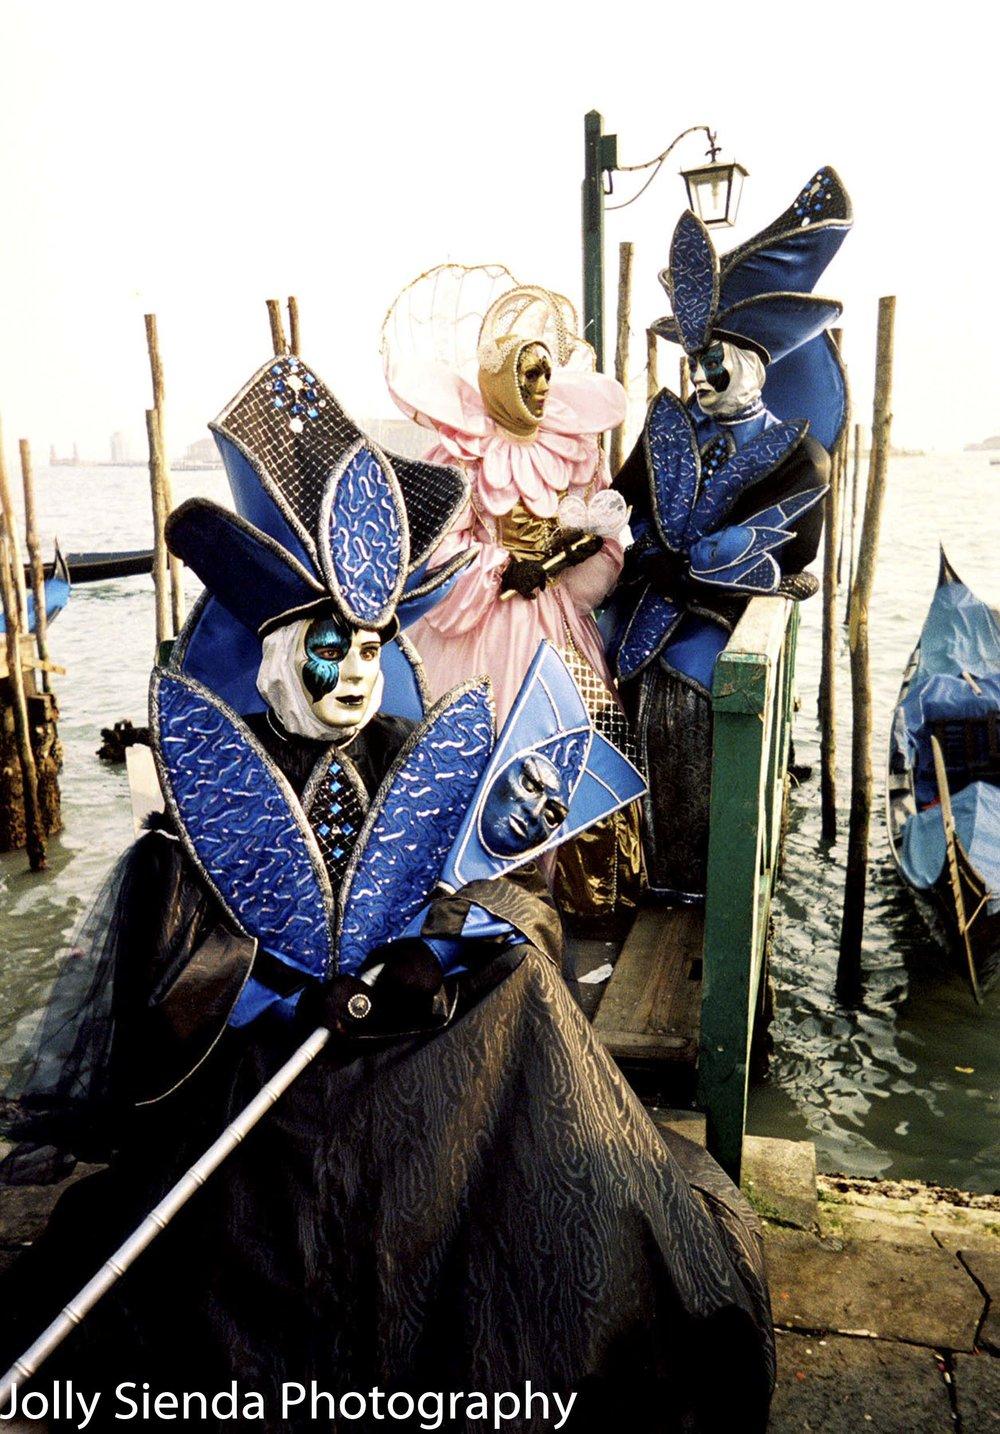 Venetian Carnival, costumes, and masks